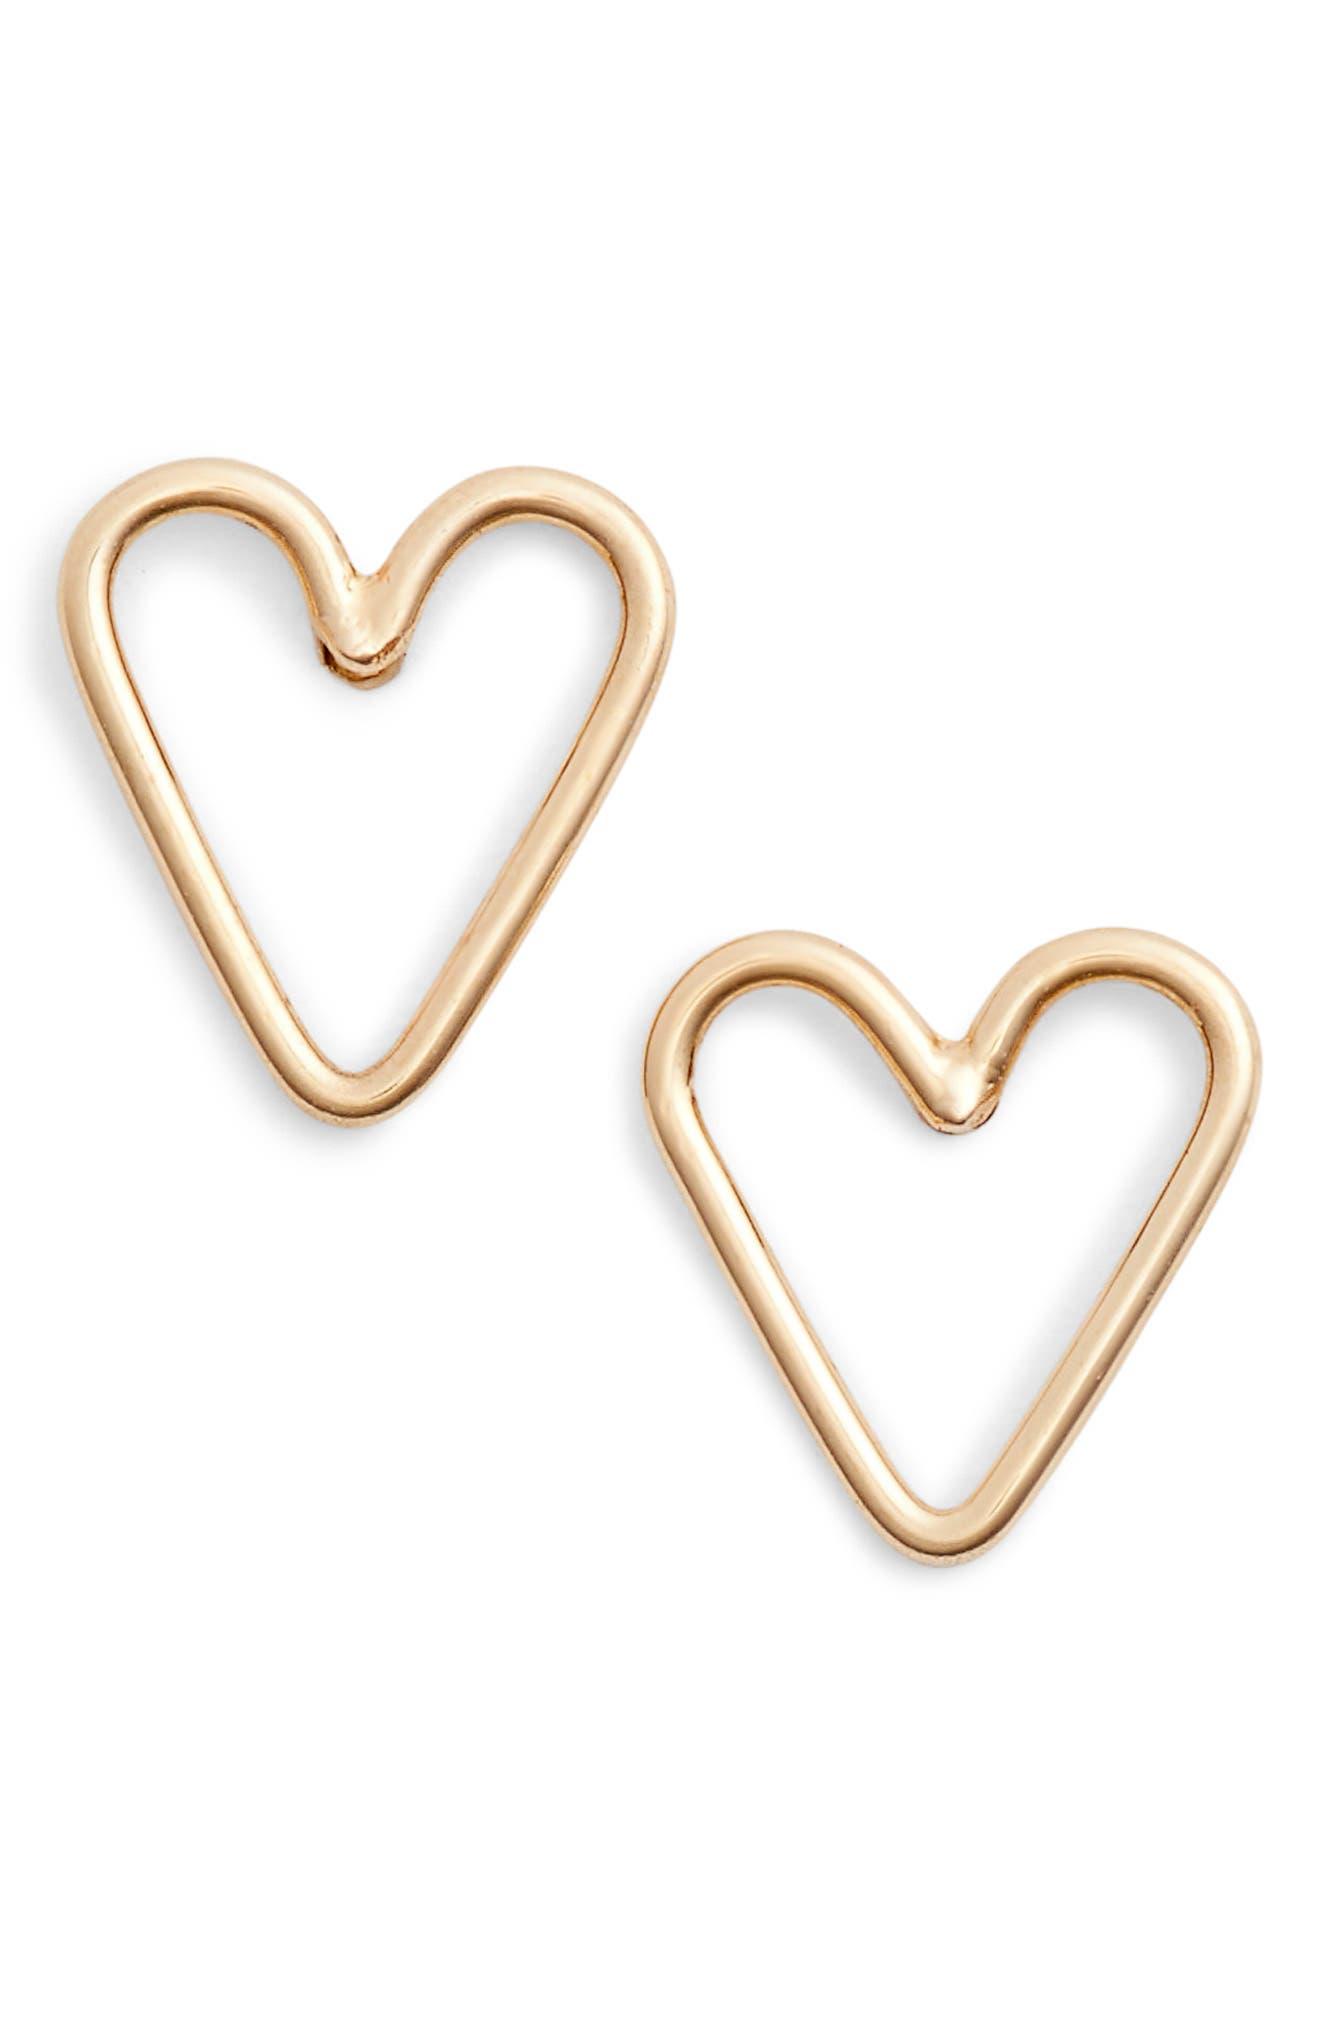 Open Heart Stud Earrings,                             Main thumbnail 1, color,                             Yellow Gold